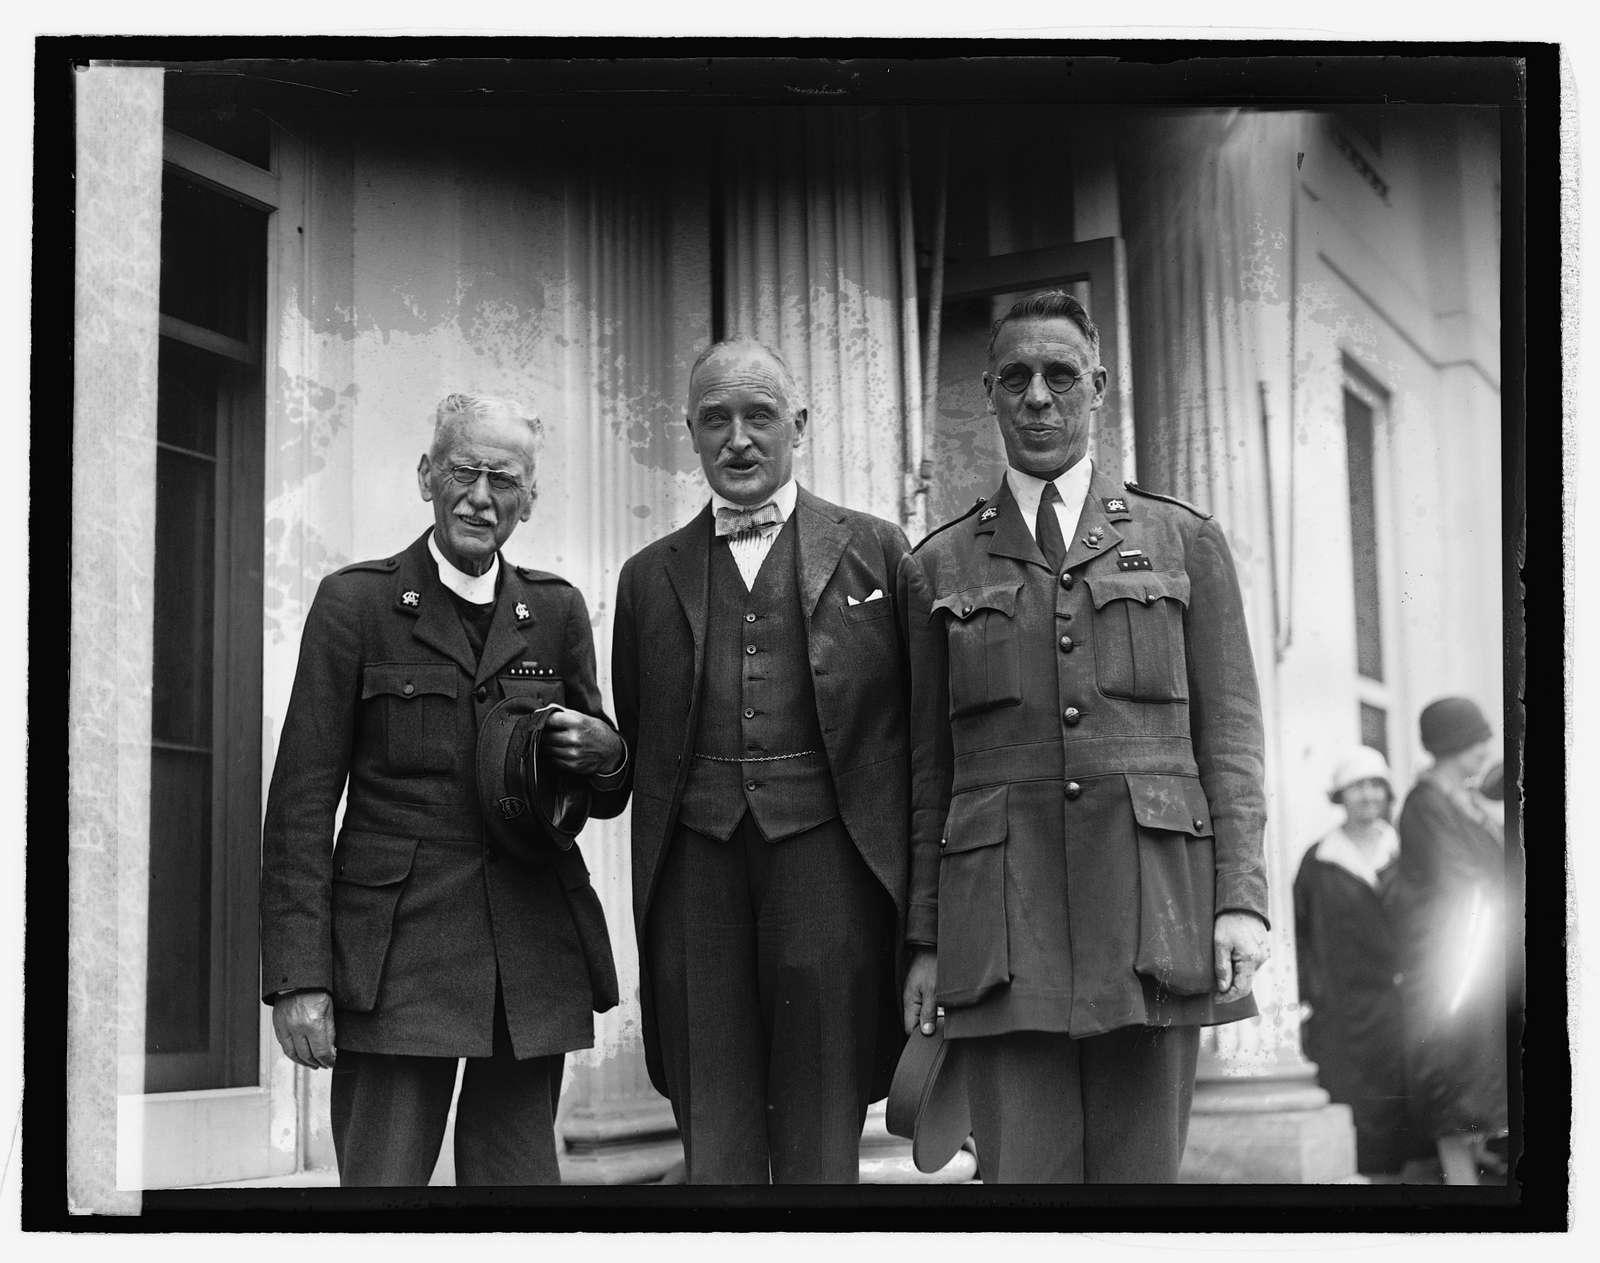 Wilson Carlile, Sir Esme Howard & Capt. B.F. Montford, 6326